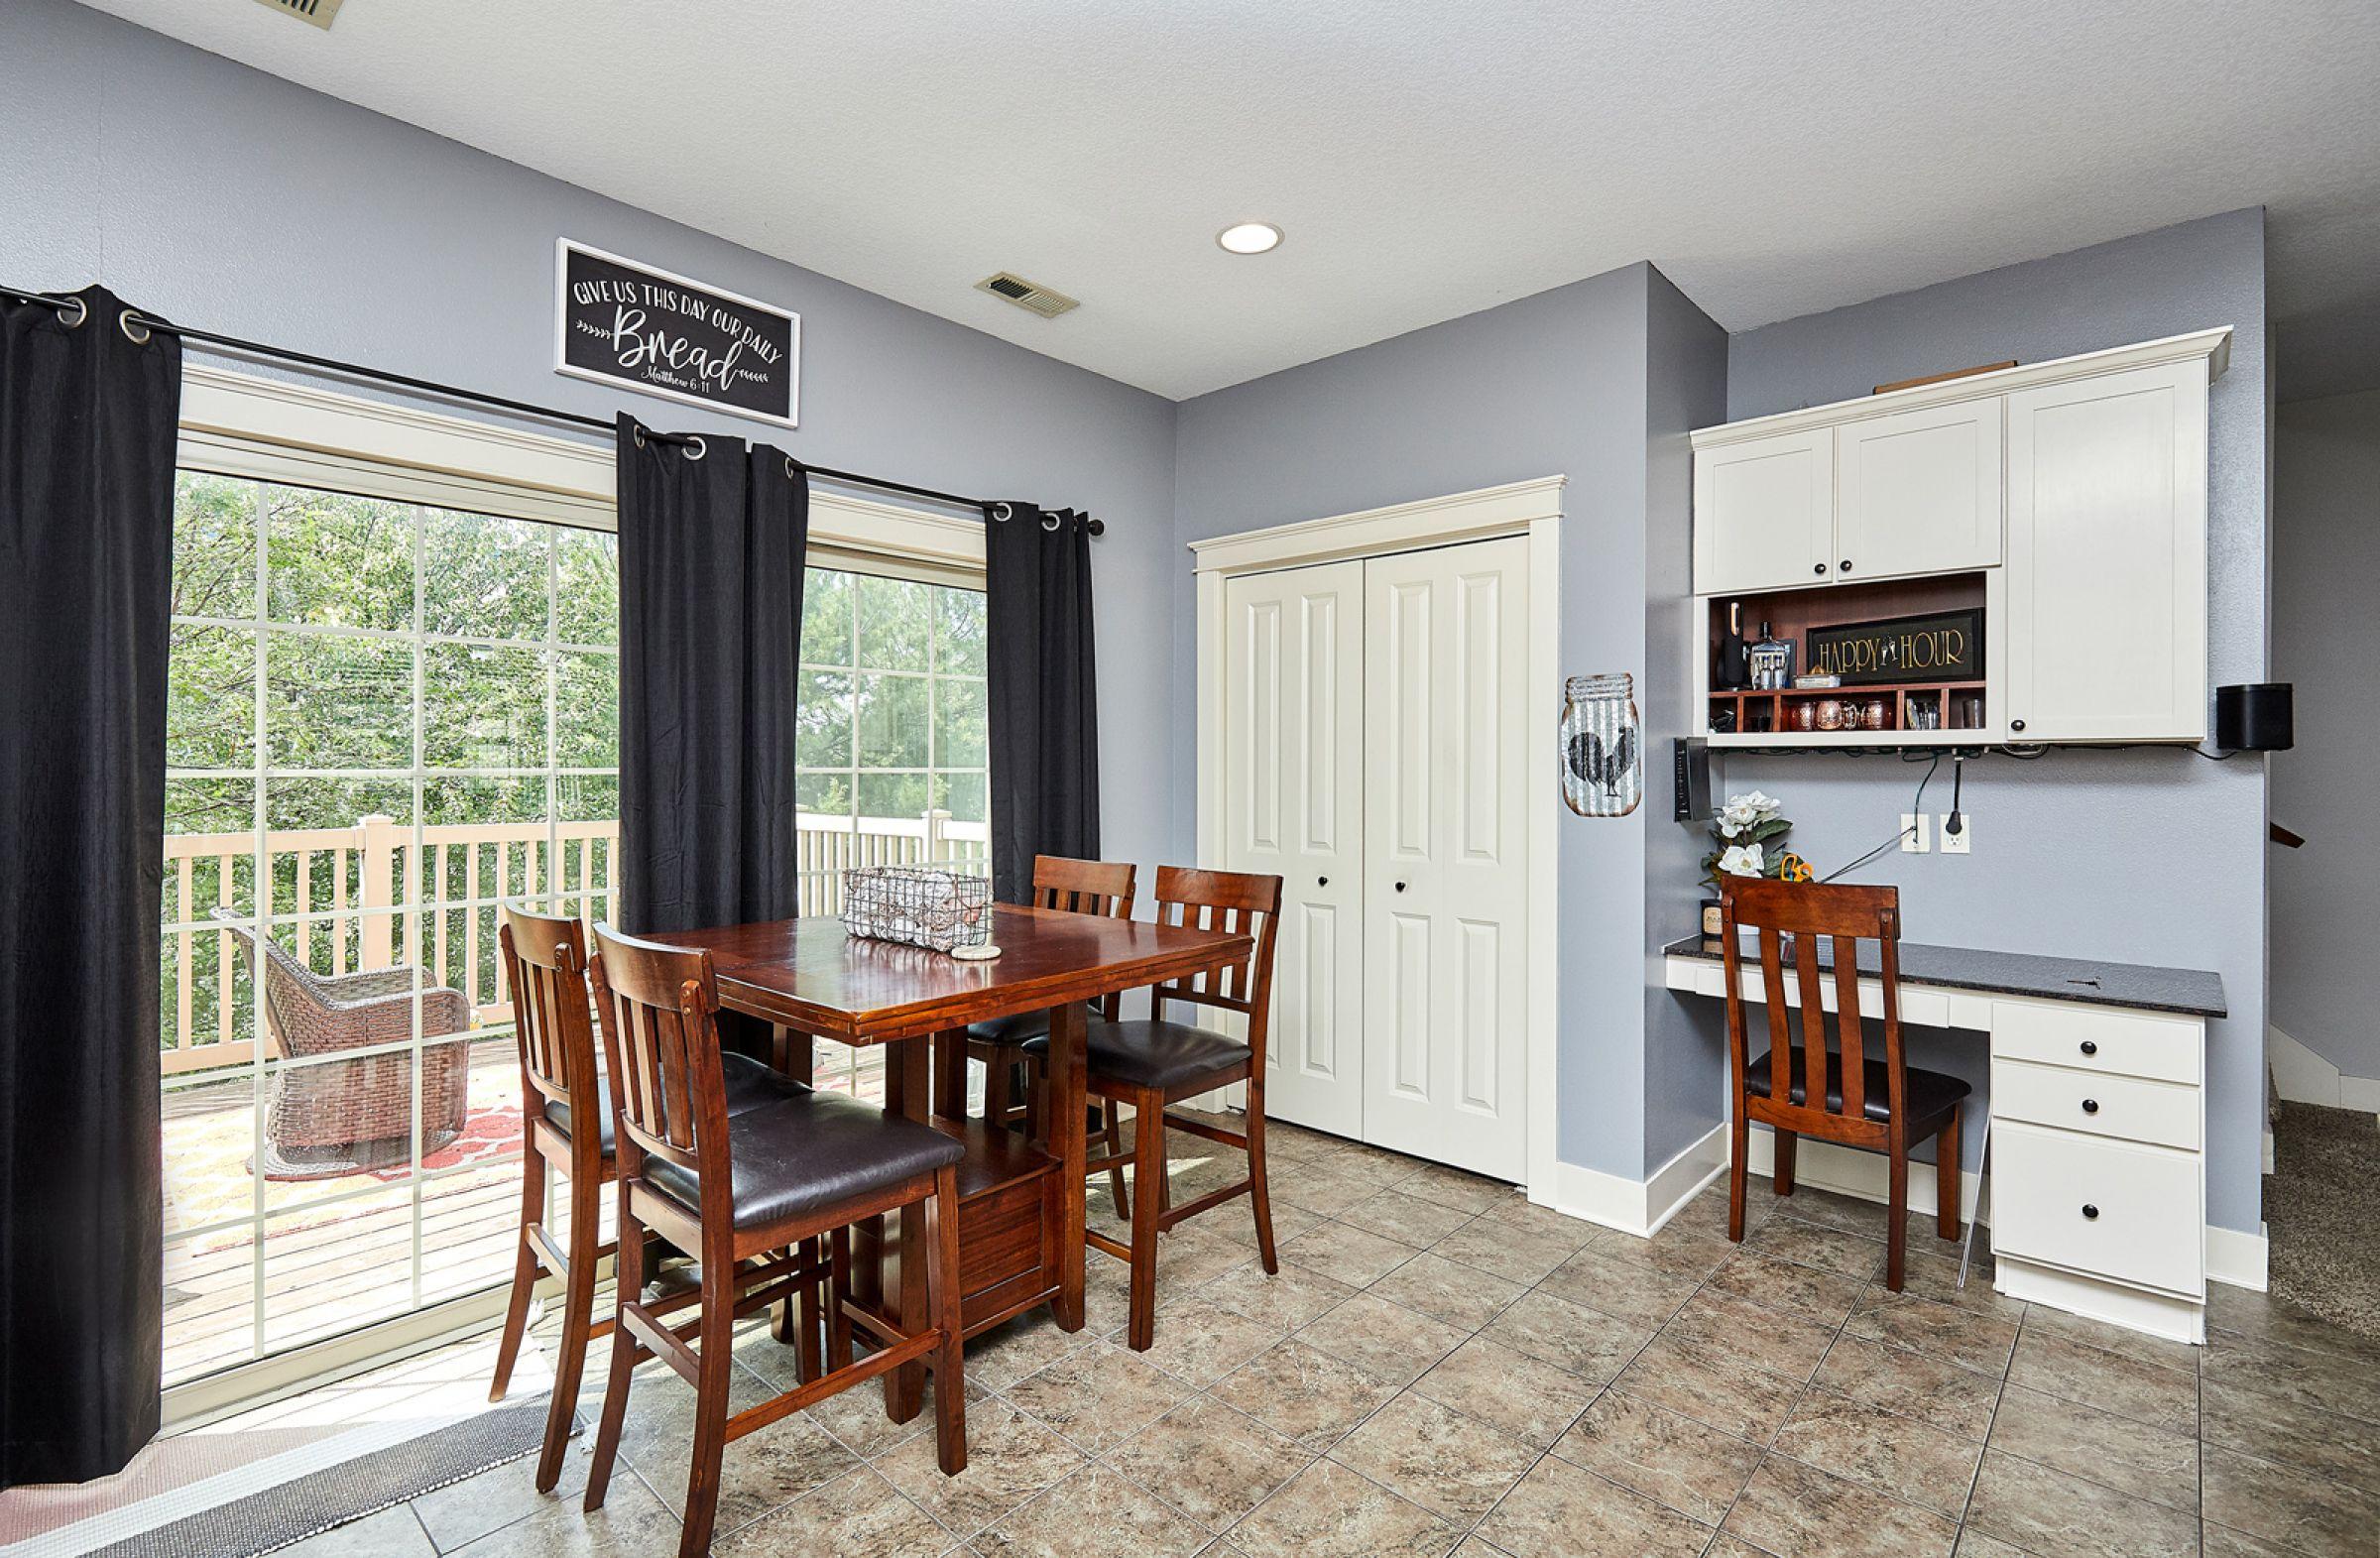 residential-polk-county-iowa-0-acres-listing-number-15662-3-2021-08-03-023440.jpg